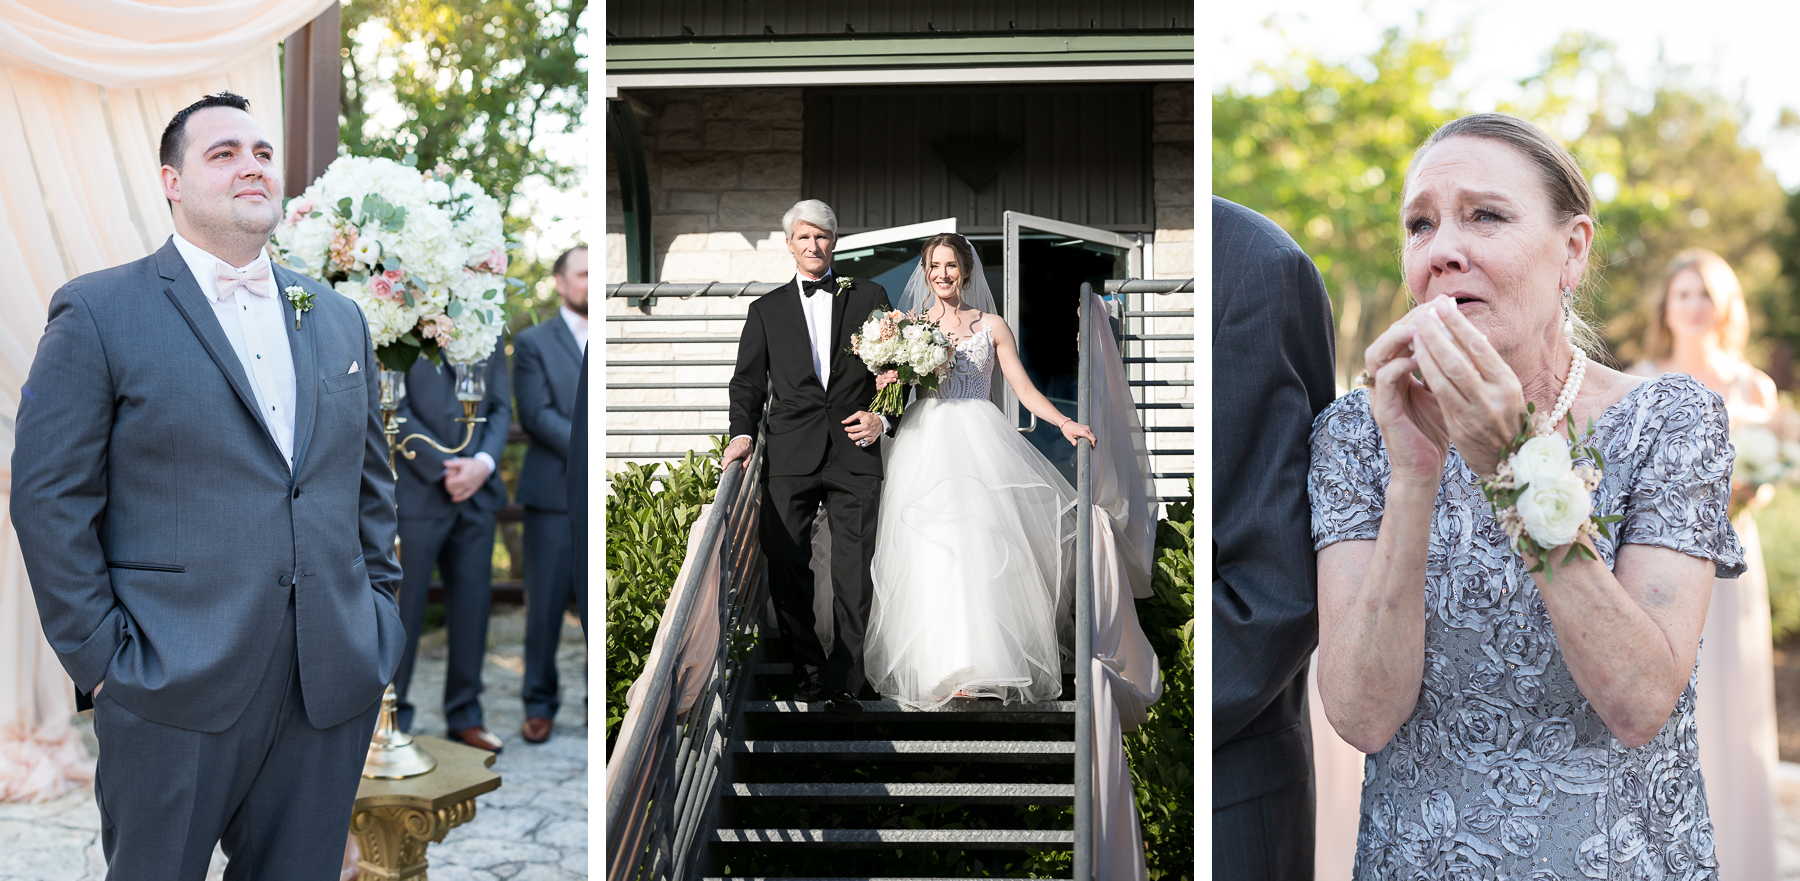 Best-wedding-photo-and-video-austin.jpg